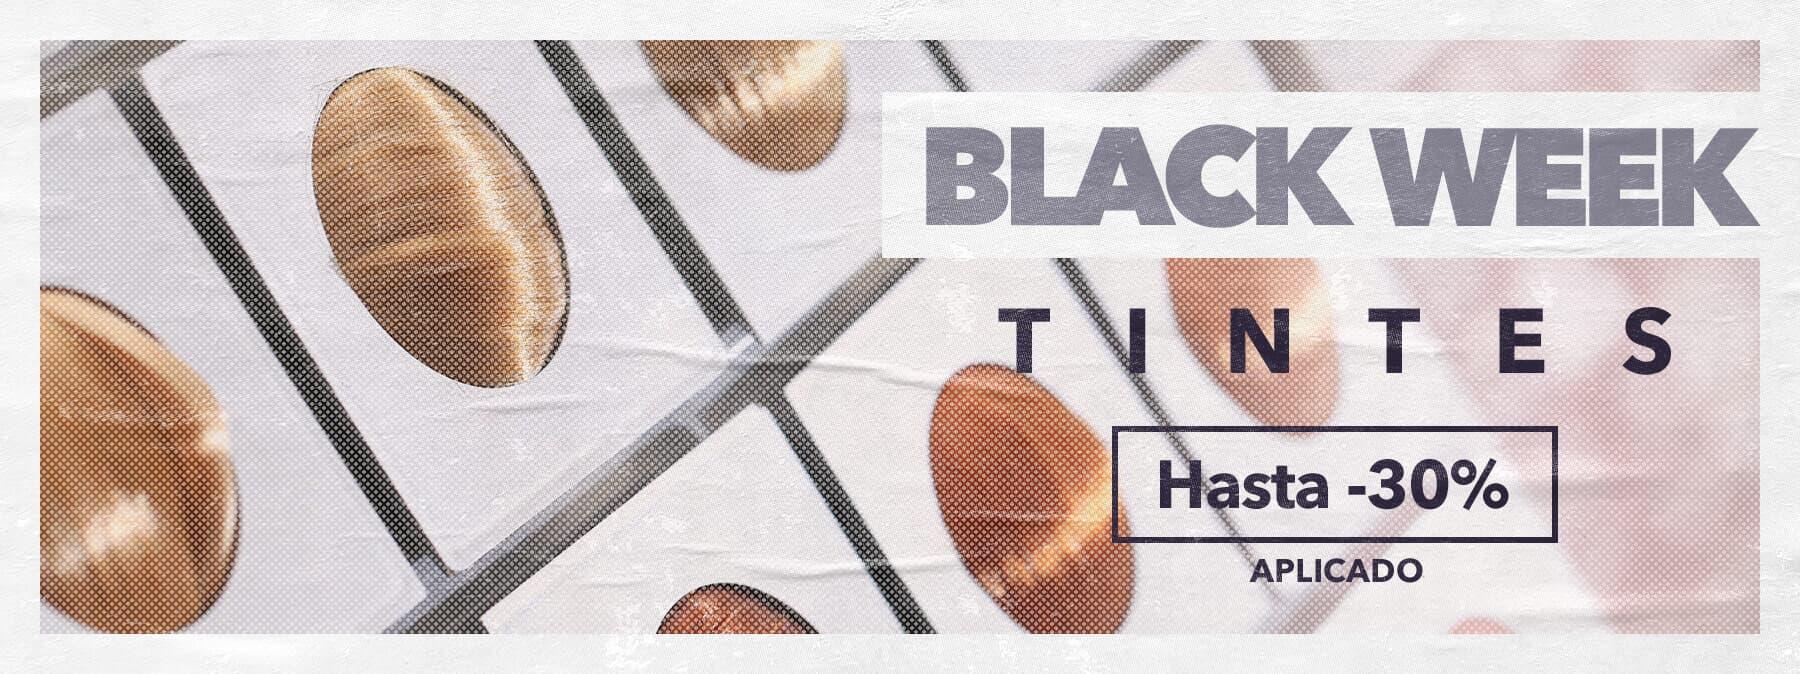 Tintes Black Week